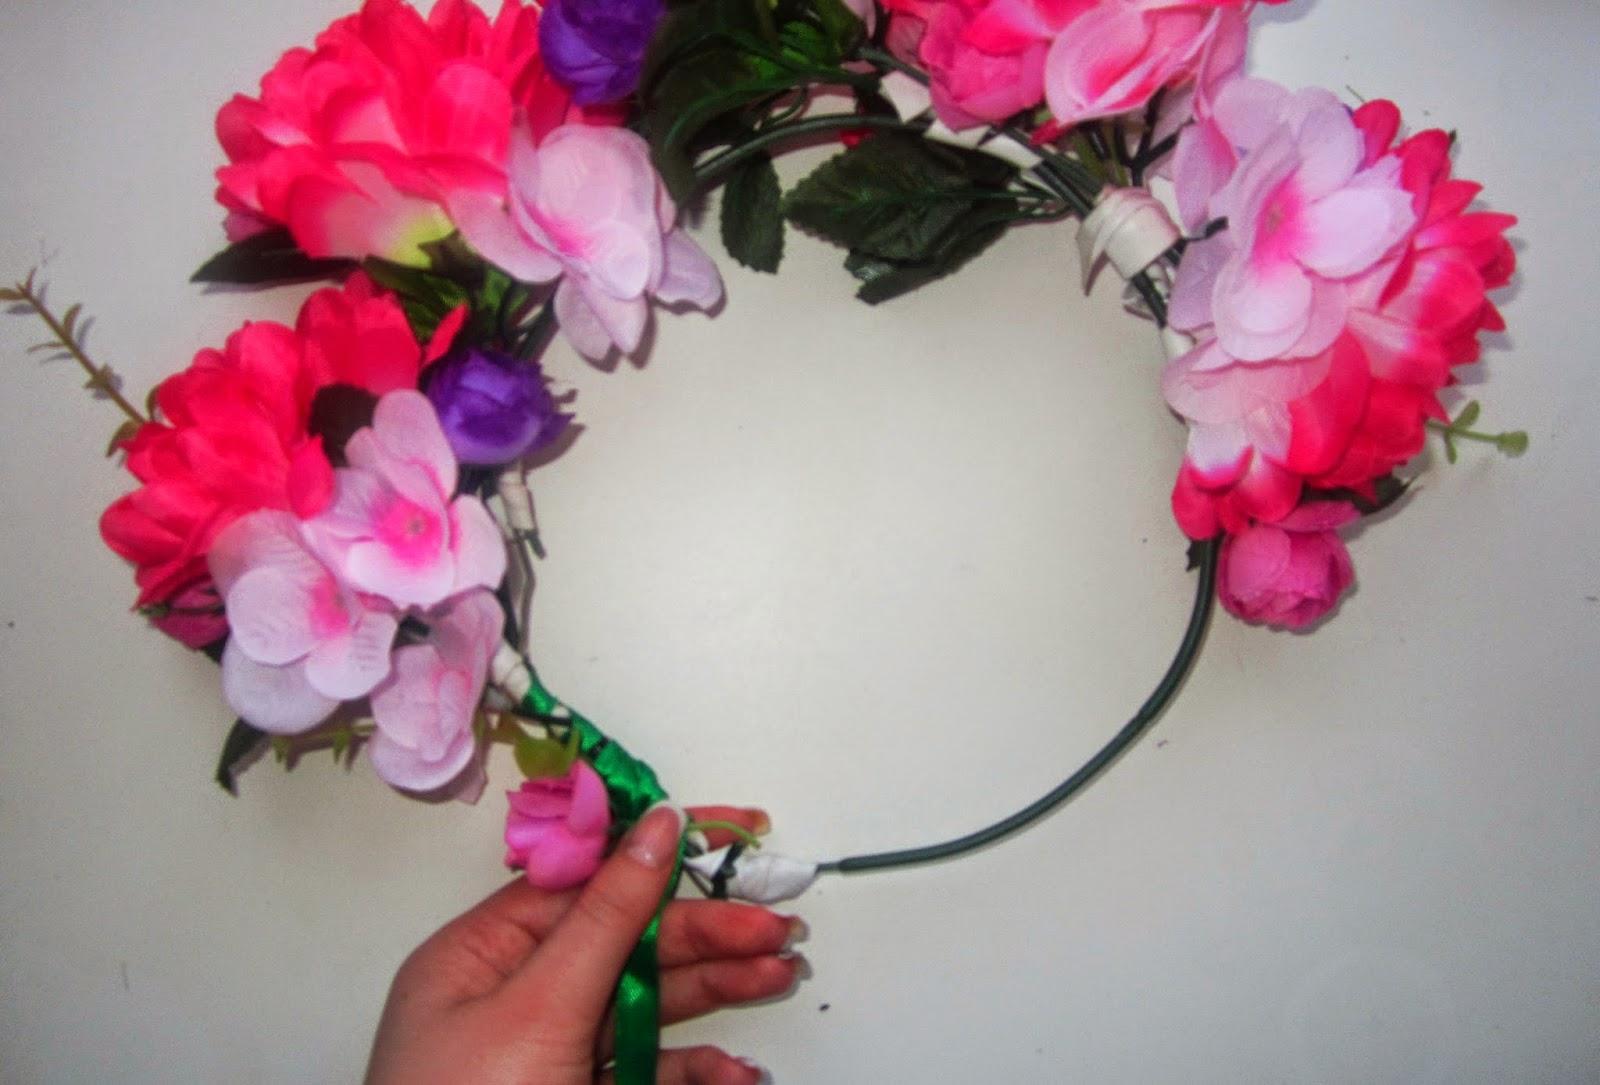 Фото венки из цветов на голову своими руками 1062